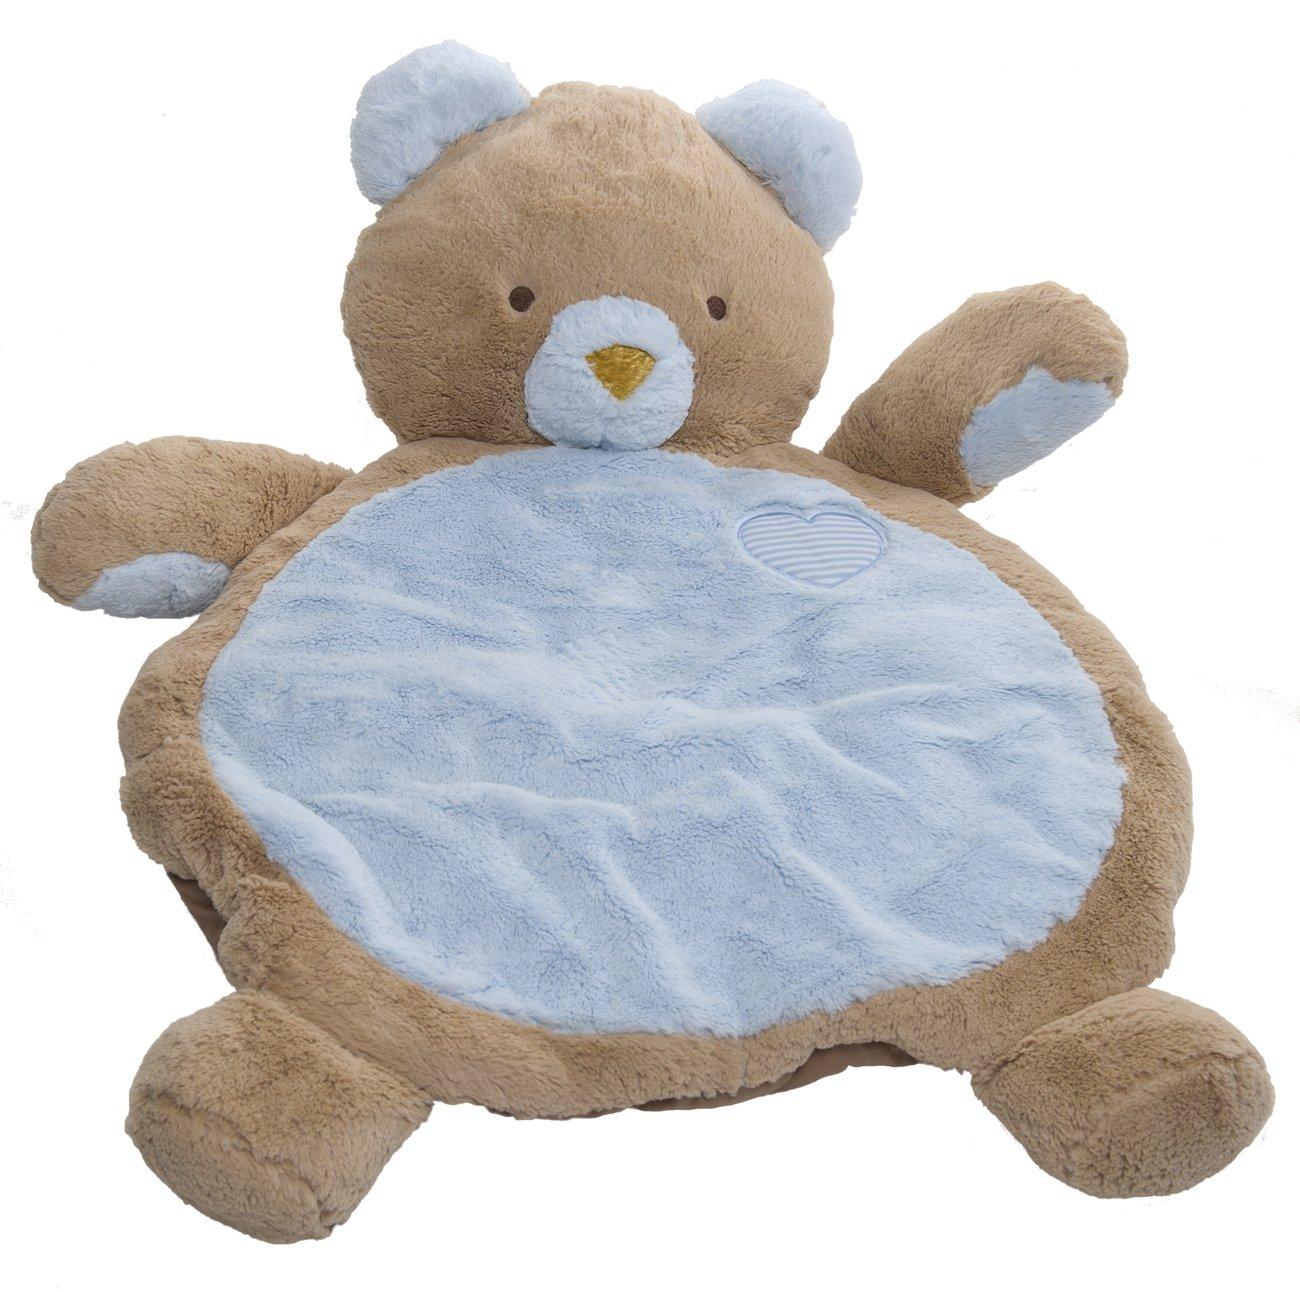 buy online babyhug pads apple rabbit purpose of blue for set mats changing multi baby diaper print mat